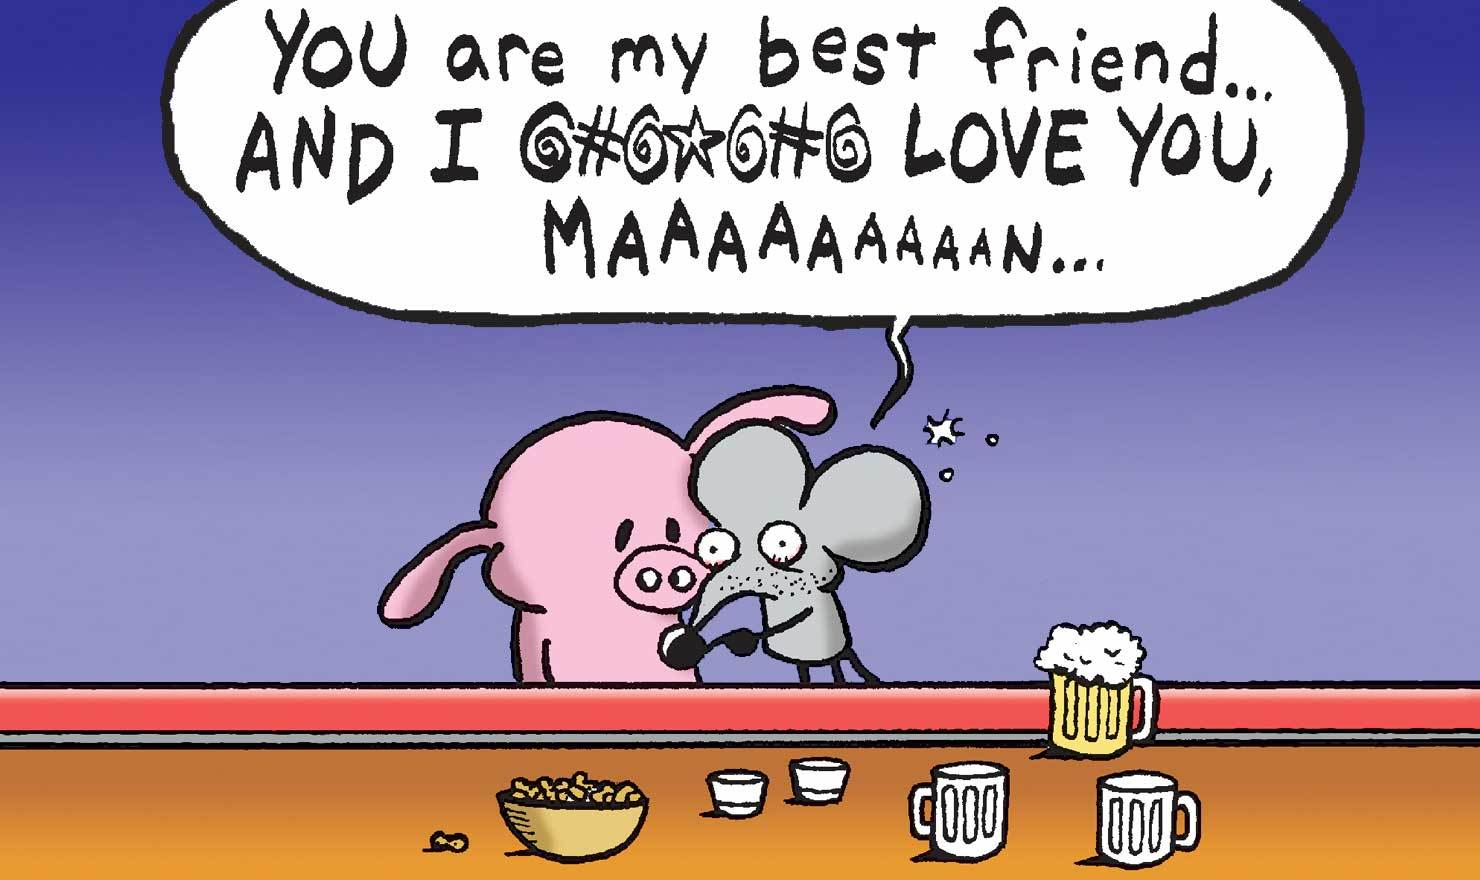 Smashing Quotes Friend S Cartoon Blog Image 3992 6779 Friends Day Comics 201705261633 Friend S photos Best Friend Pictures